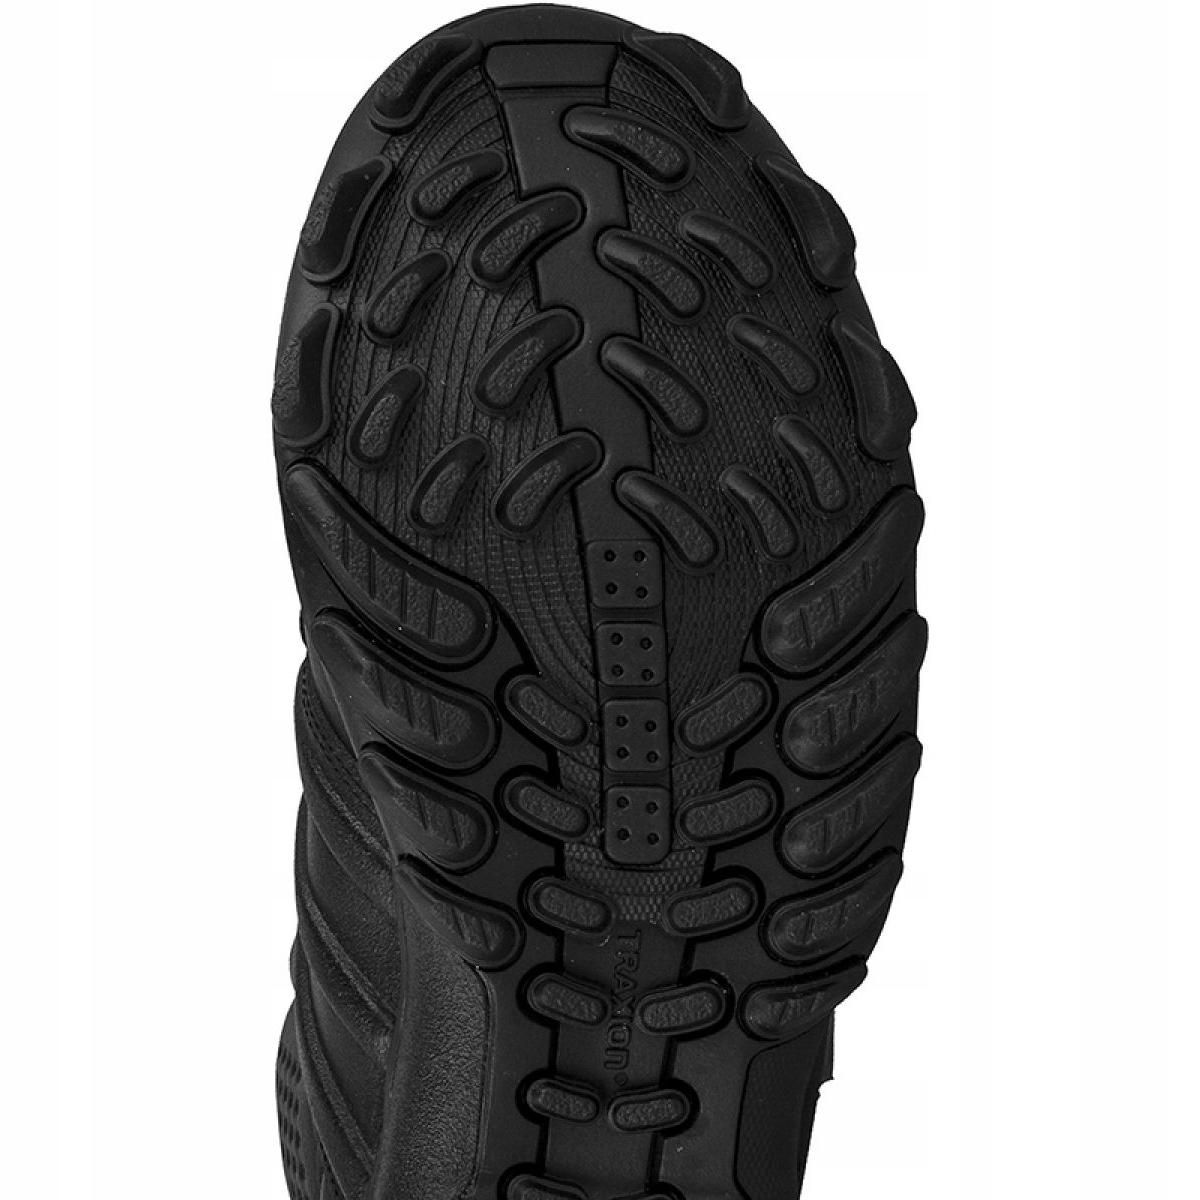 Buty trekkingowe Adidas Gsg 9.7 G62307 kup online | eMAG.pl